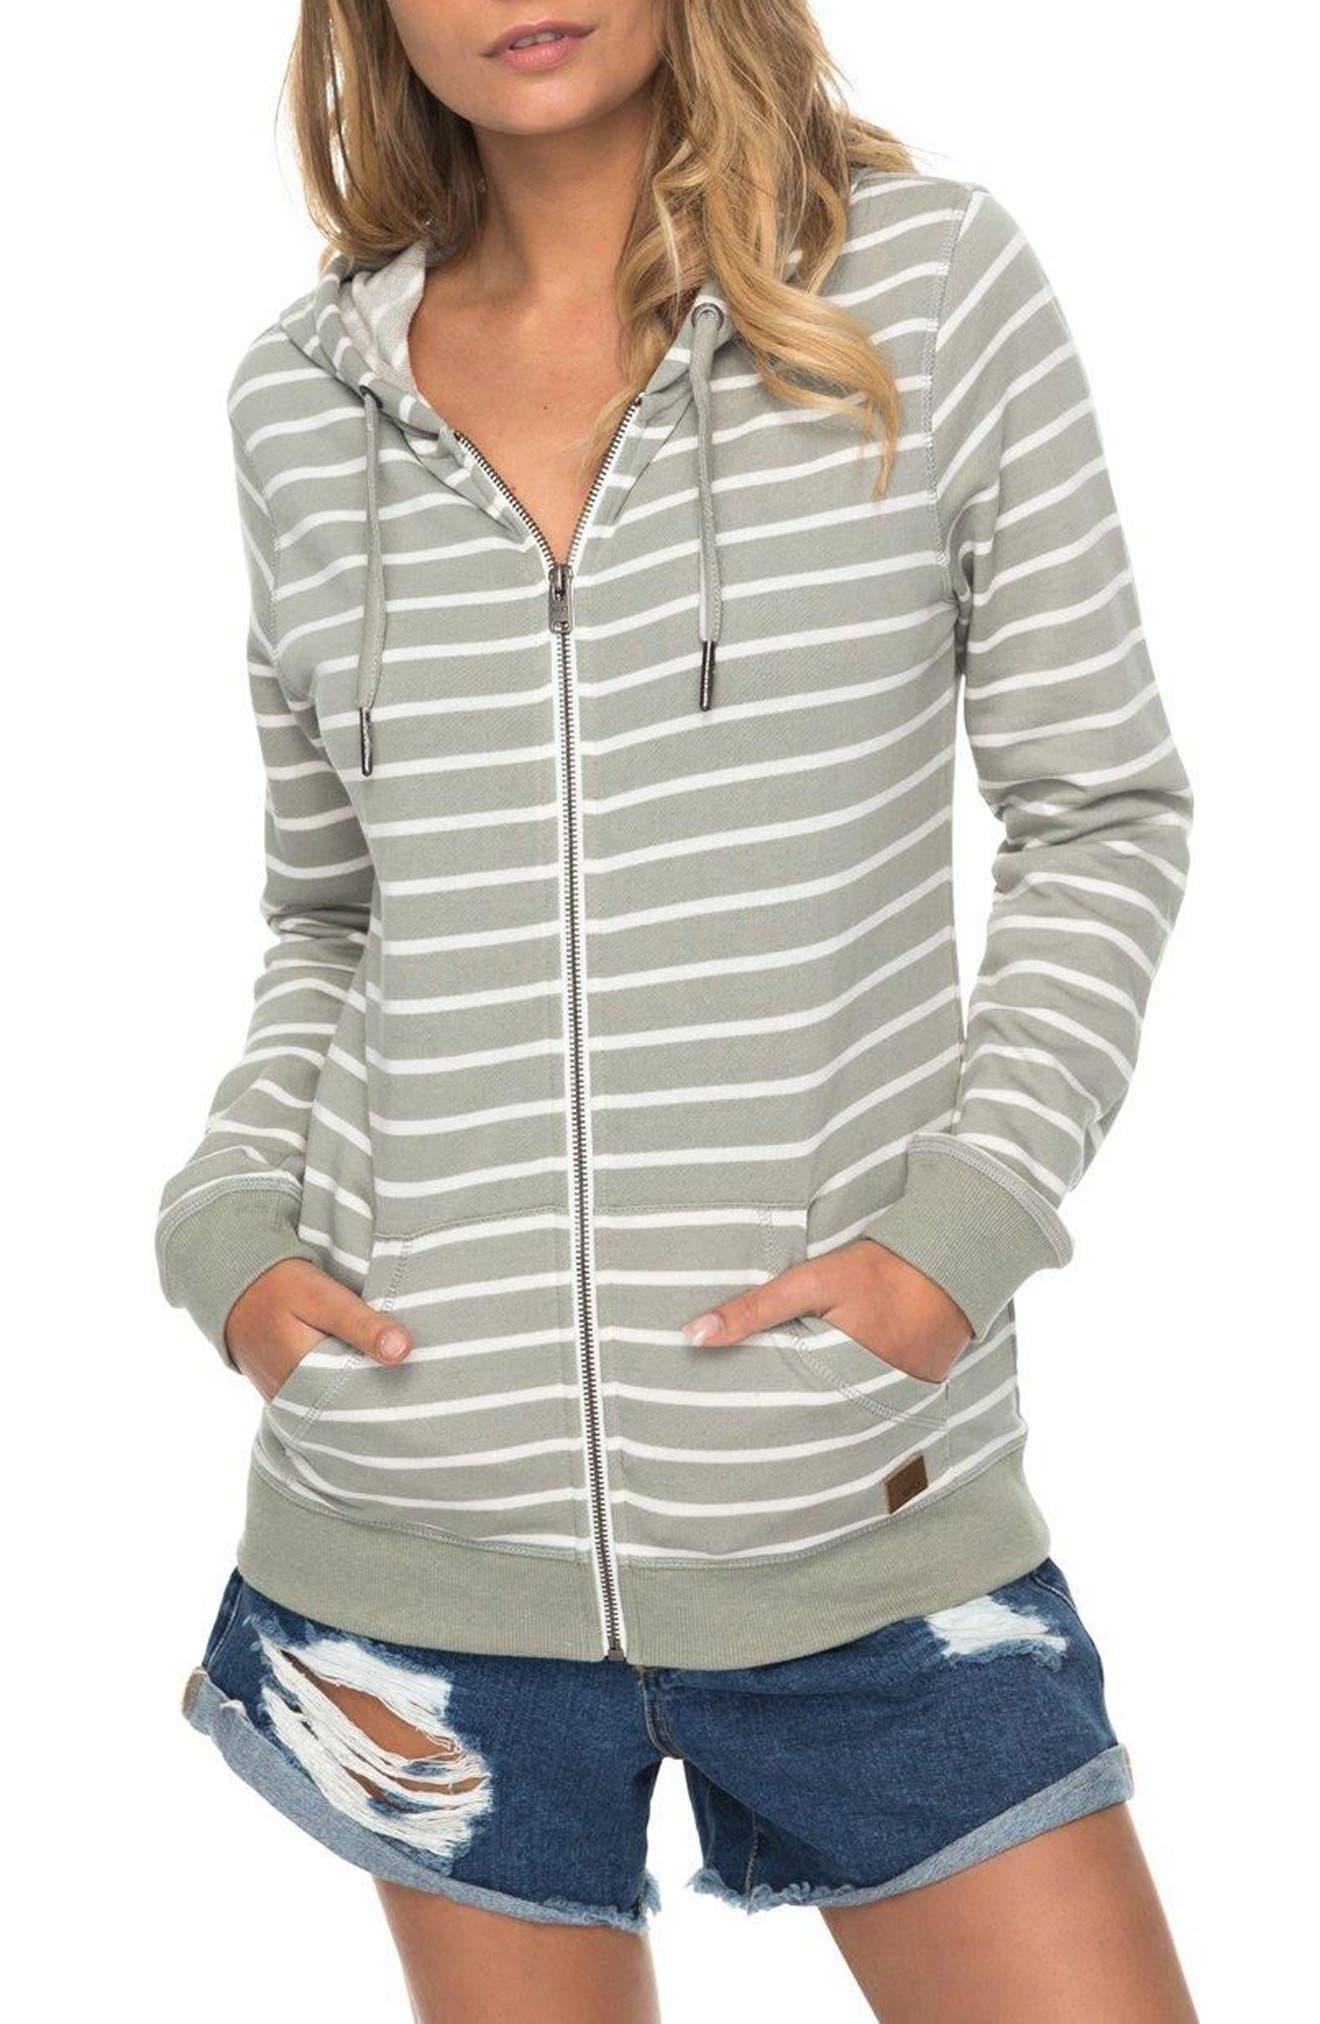 Main Image - Roxy Trippin Stripe Hoodie